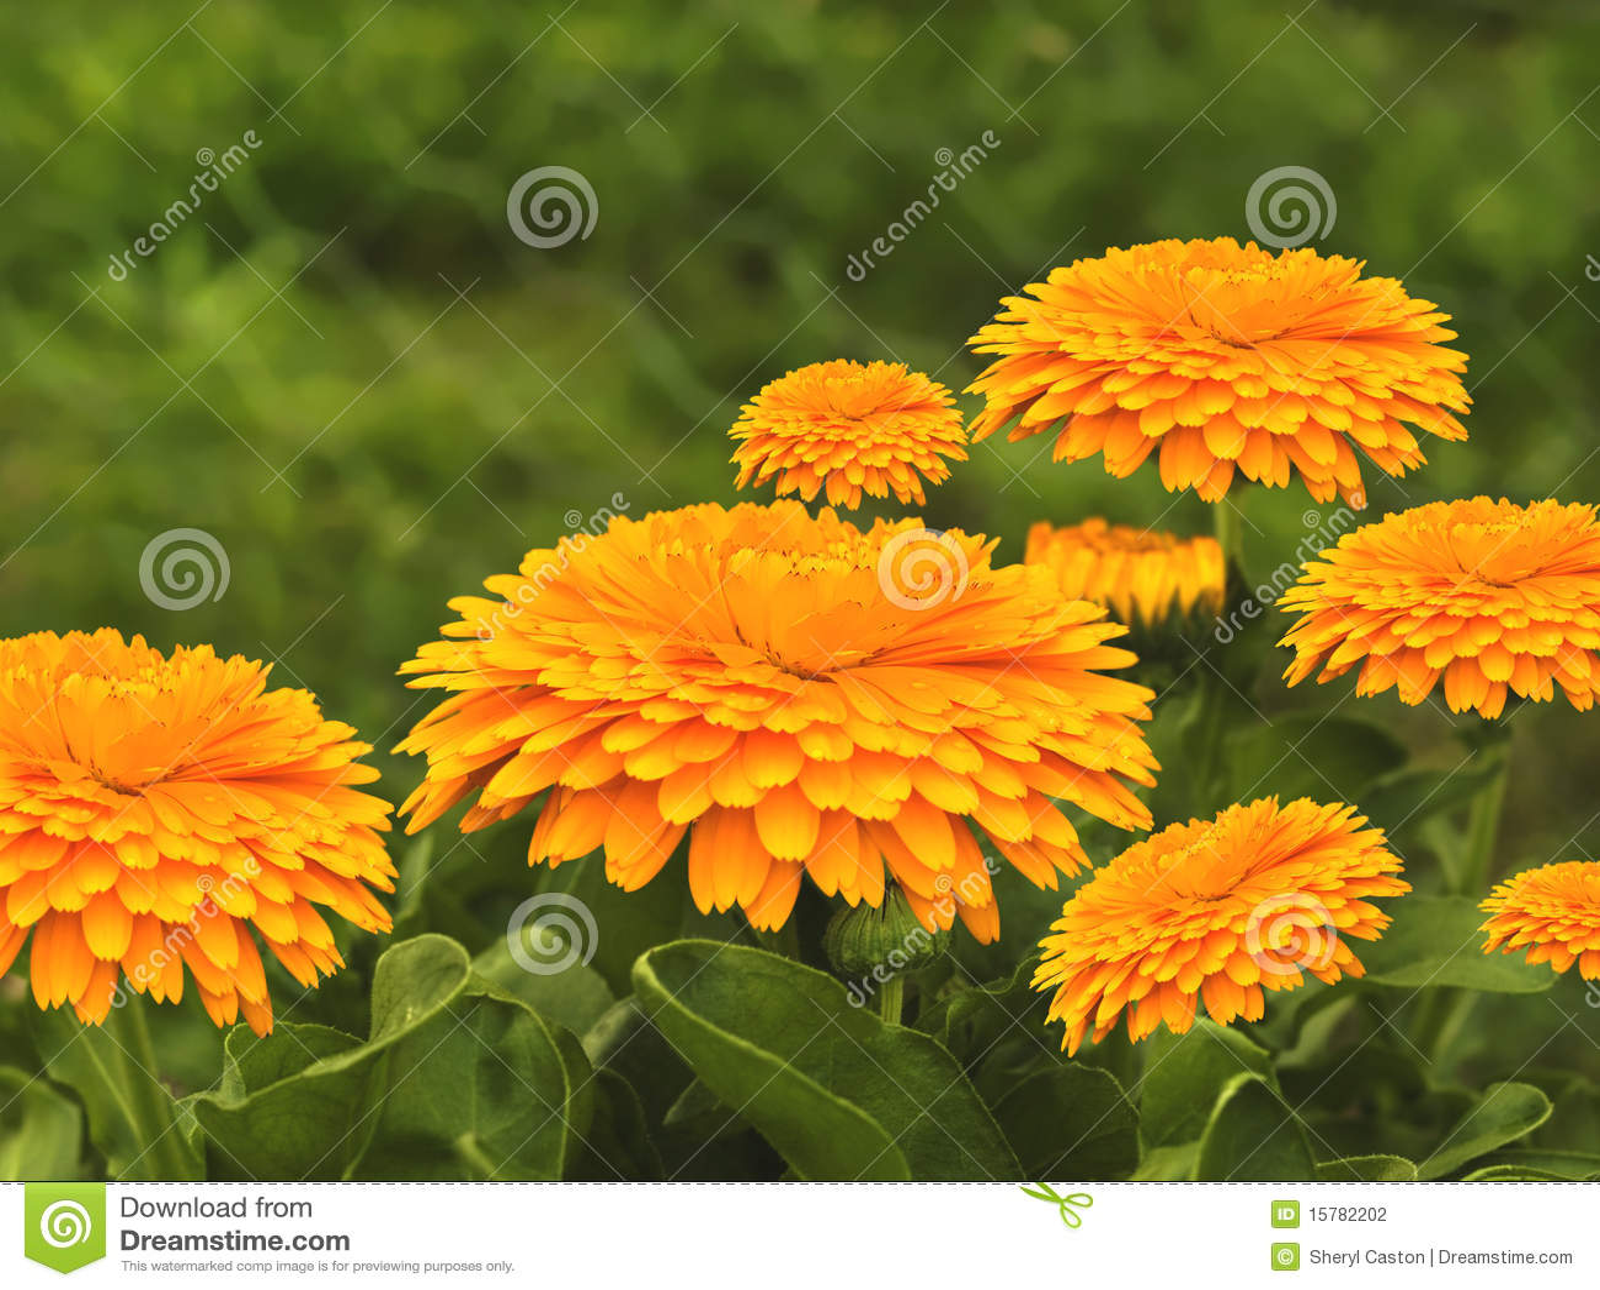 Spring Flowers Golden Calendula Background Stock Photo Image Of